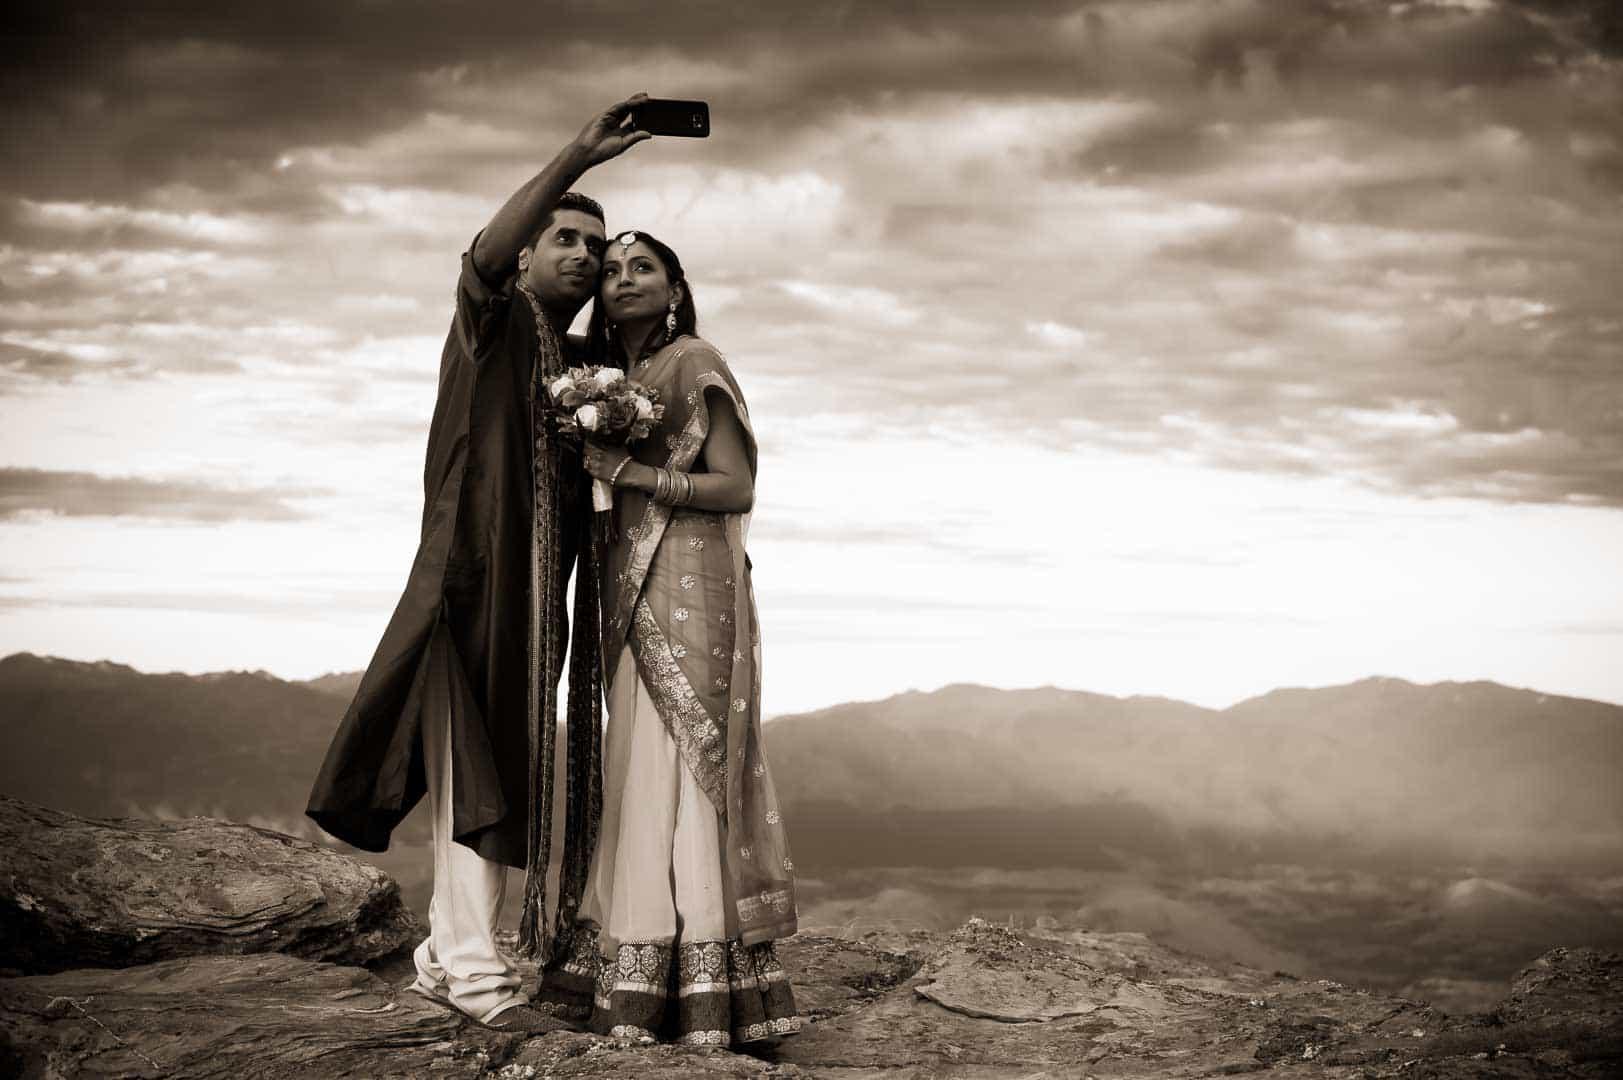 Queenstown Wedding Photographer Rav and Shirlene's sunset heli-wedding - The Ledge, Cecil Peak fallon photography